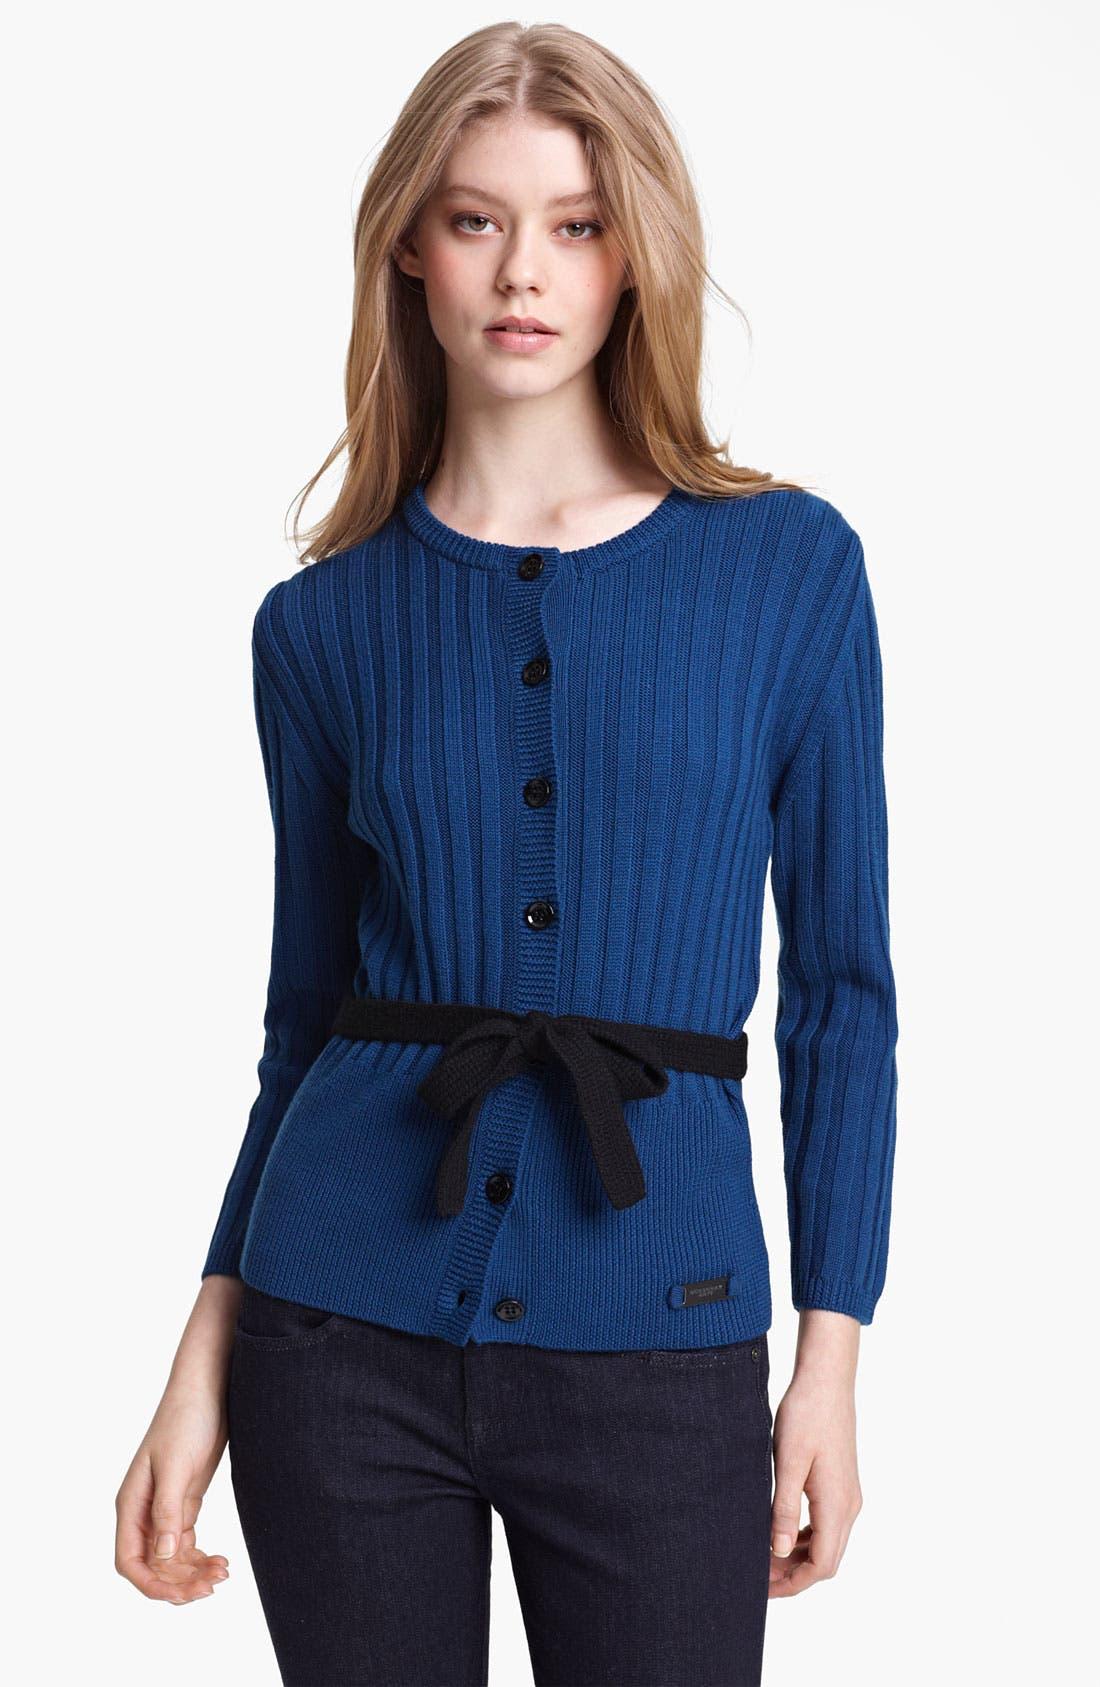 Alternate Image 1 Selected - Burberry Brit Knit Merino Wool Cardigan